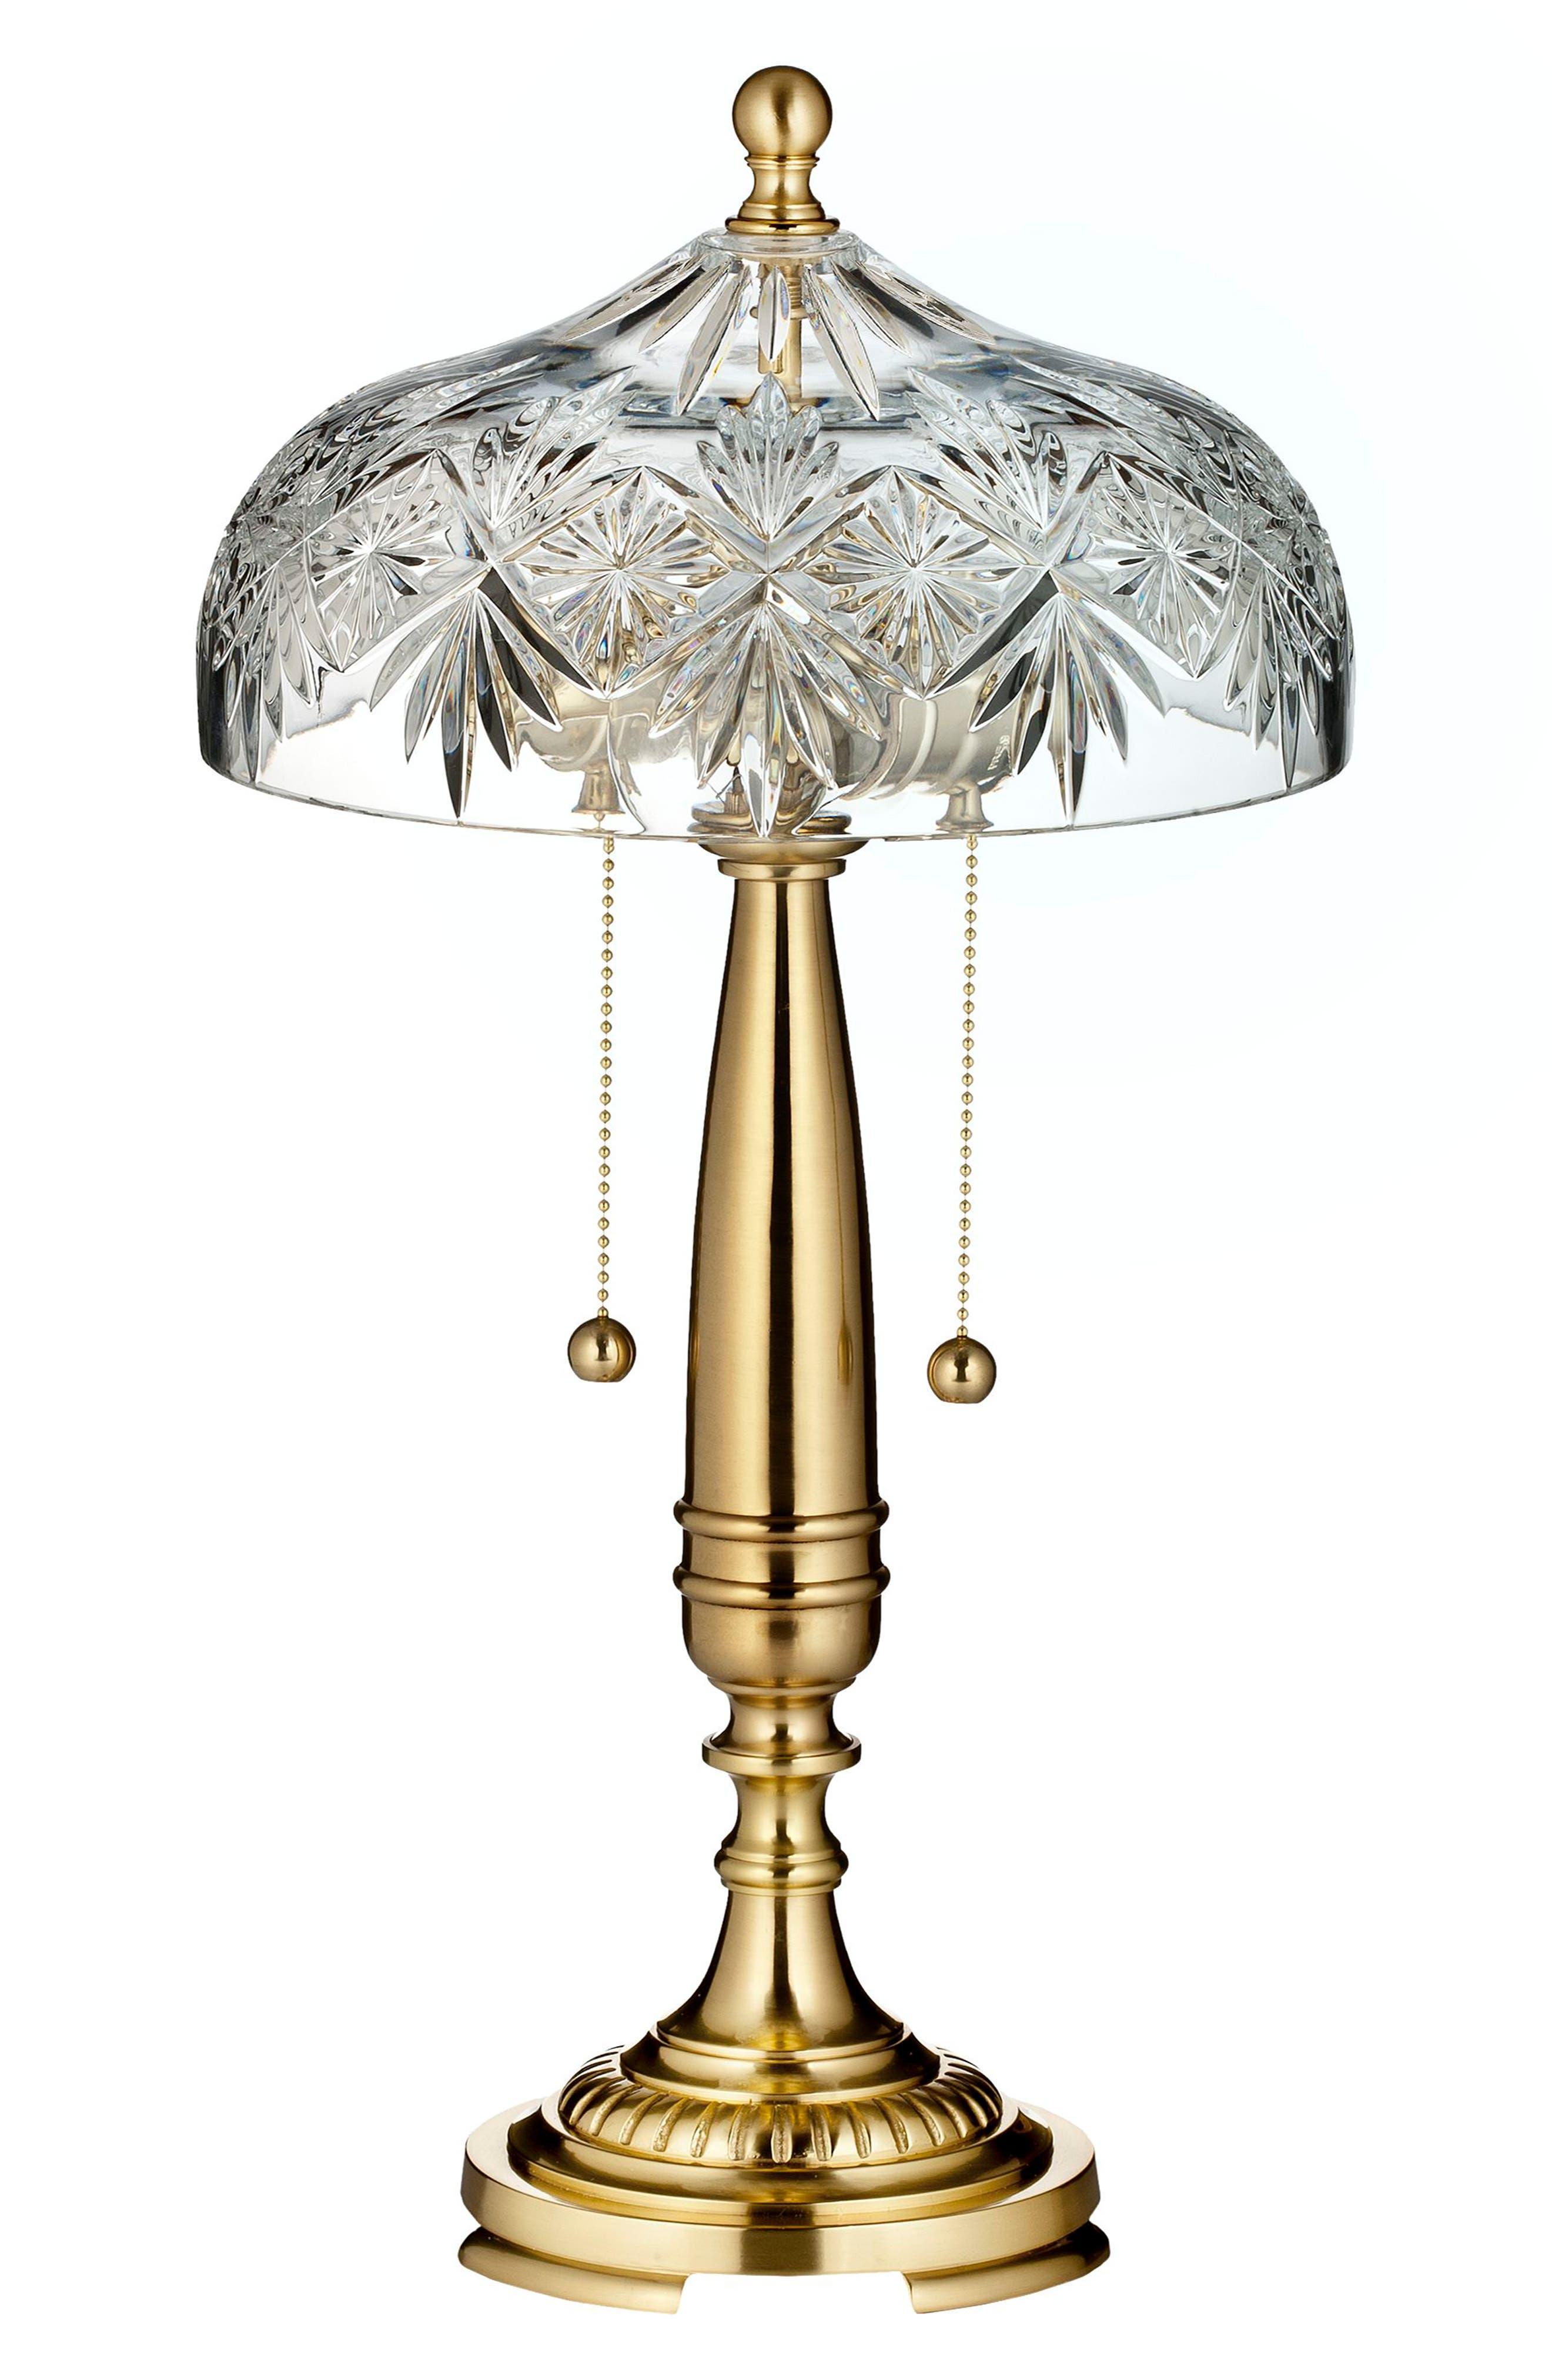 Alternate Image 1 Selected - Waterford Renmore Lead Crystal Table Lamp